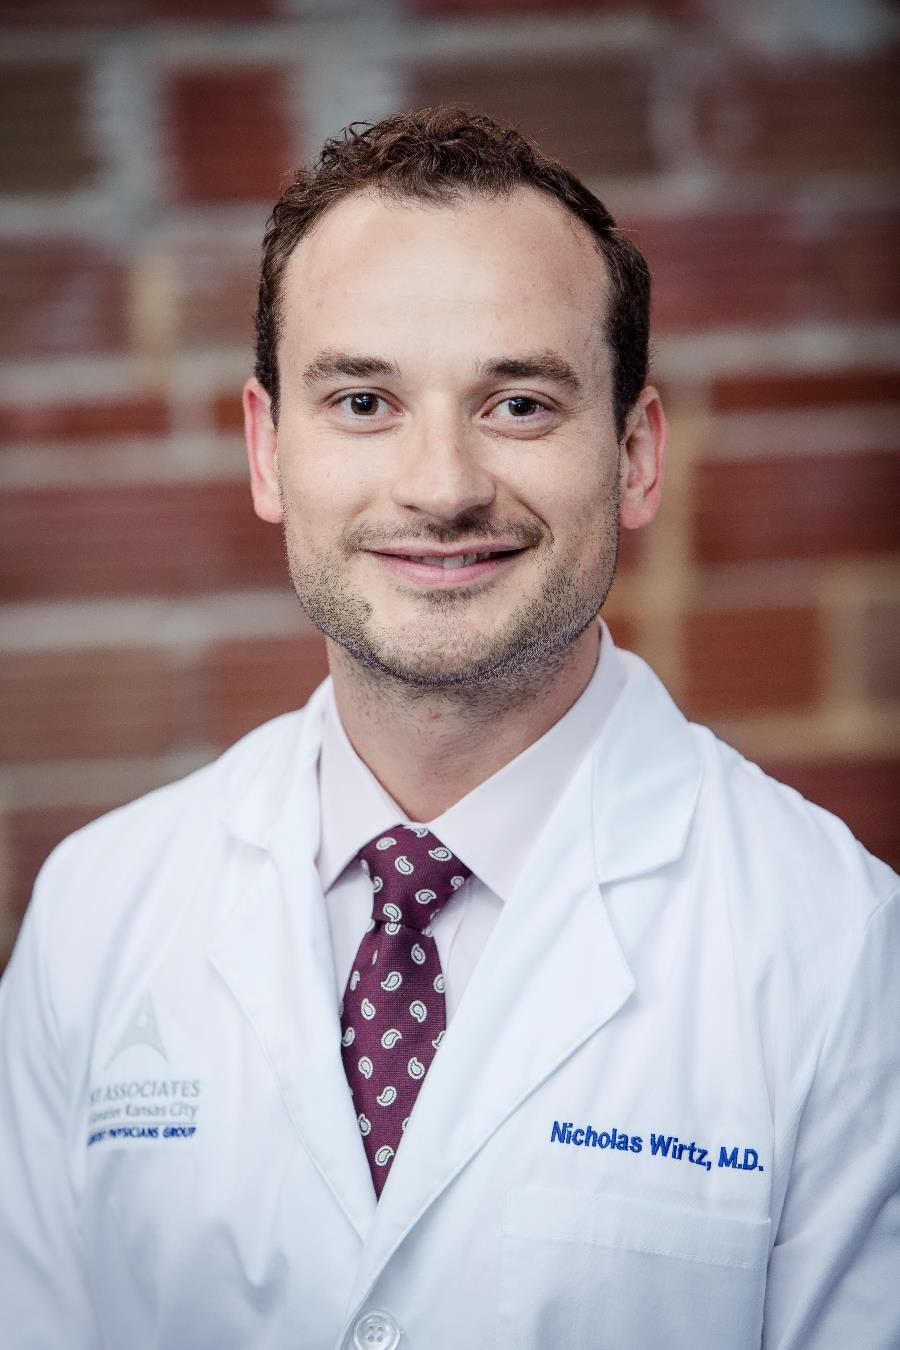 Nicholas Wirtz, MD